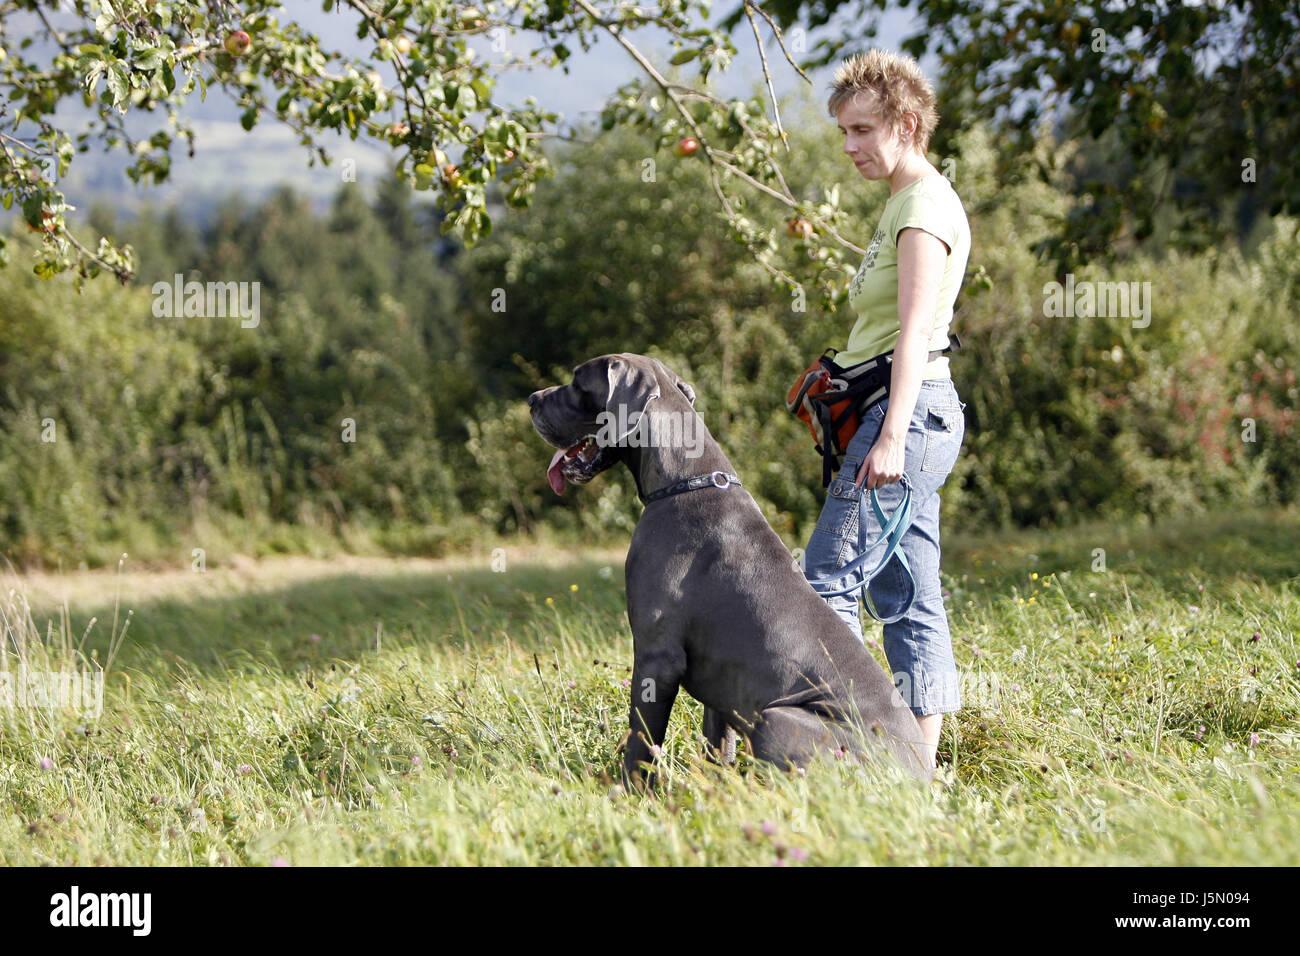 german mastiff dog sitting with wife - Stock Image